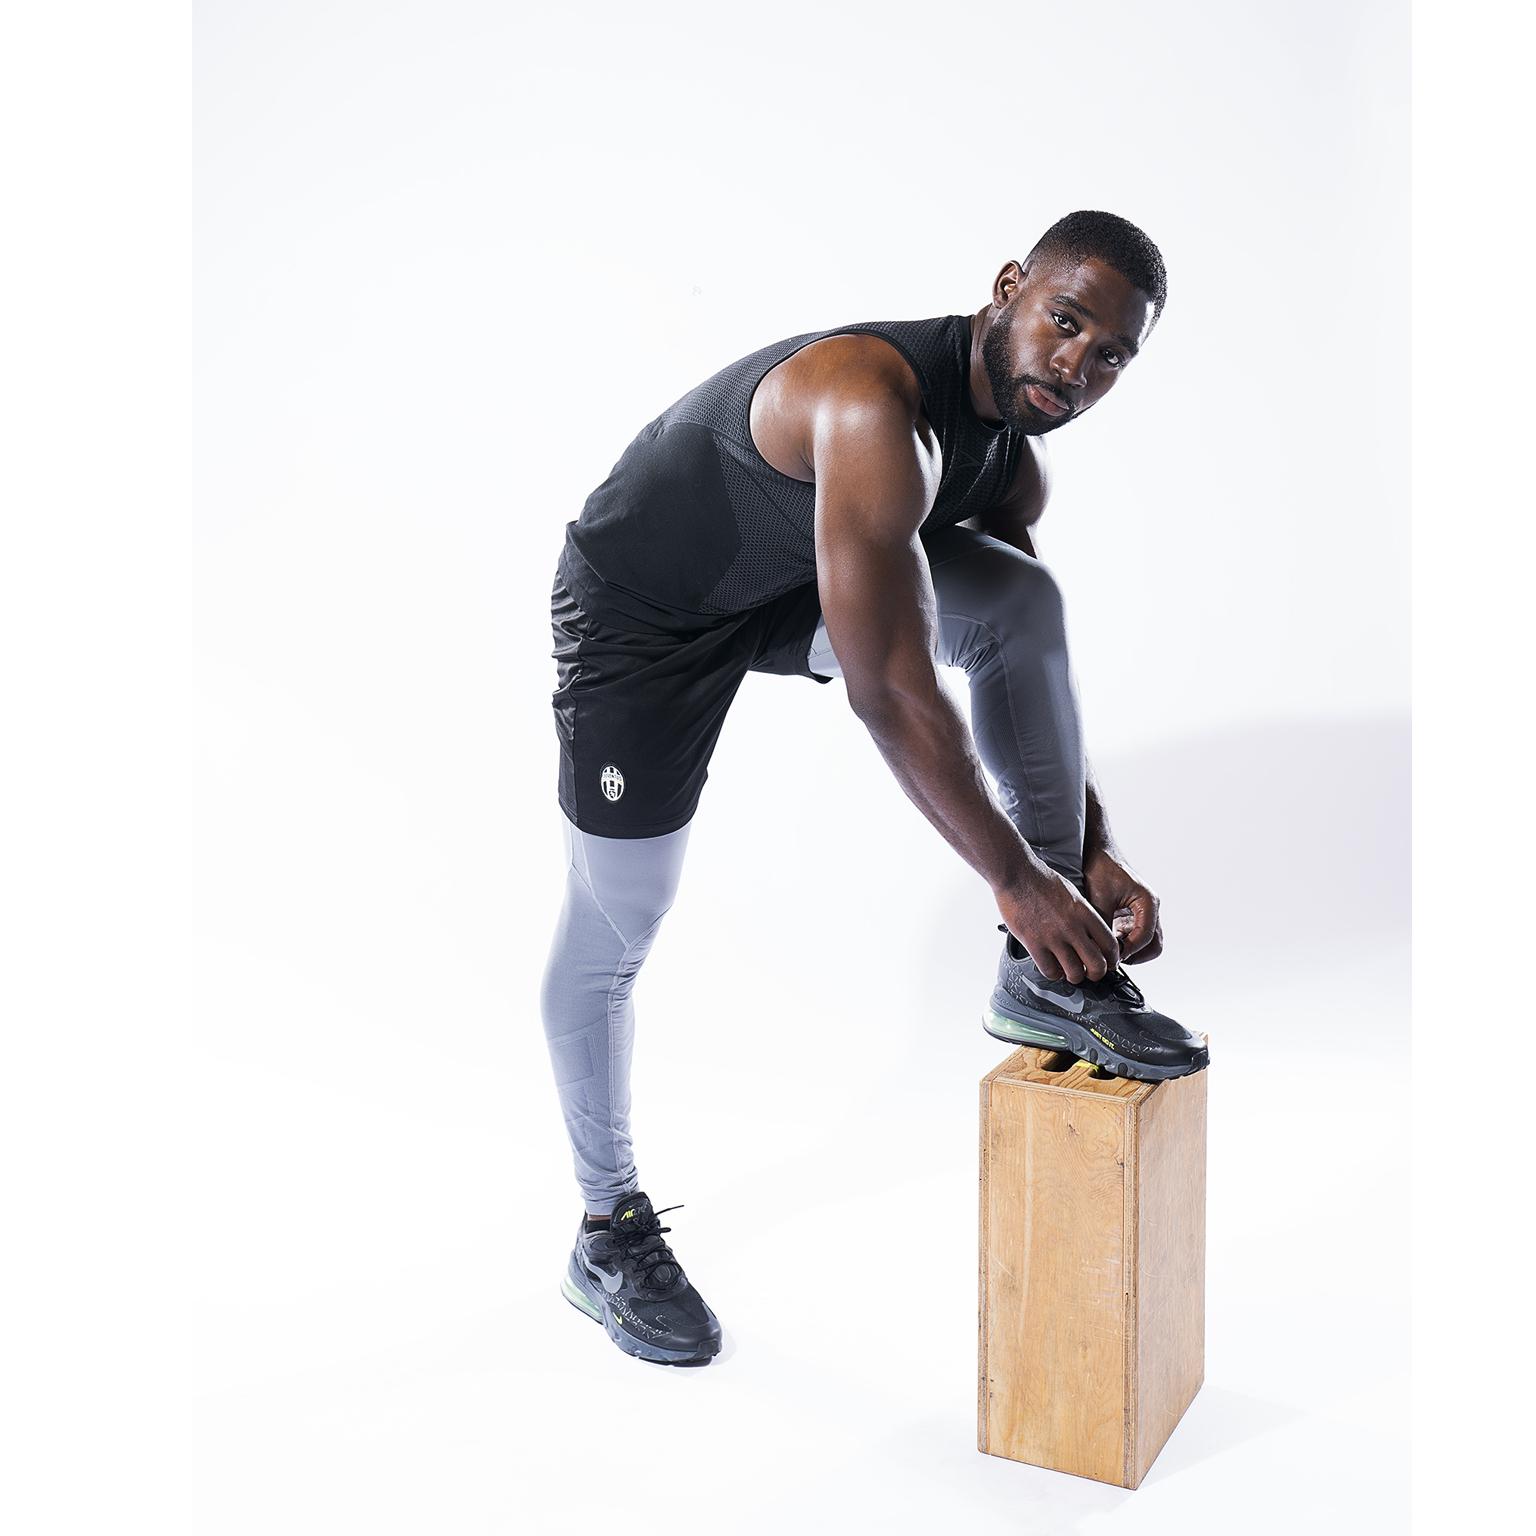 Toronto-Fitness-Model-Agency-Fitness-Casual-Commercial-Perez-Tieku-Fitness-Model-Athlete